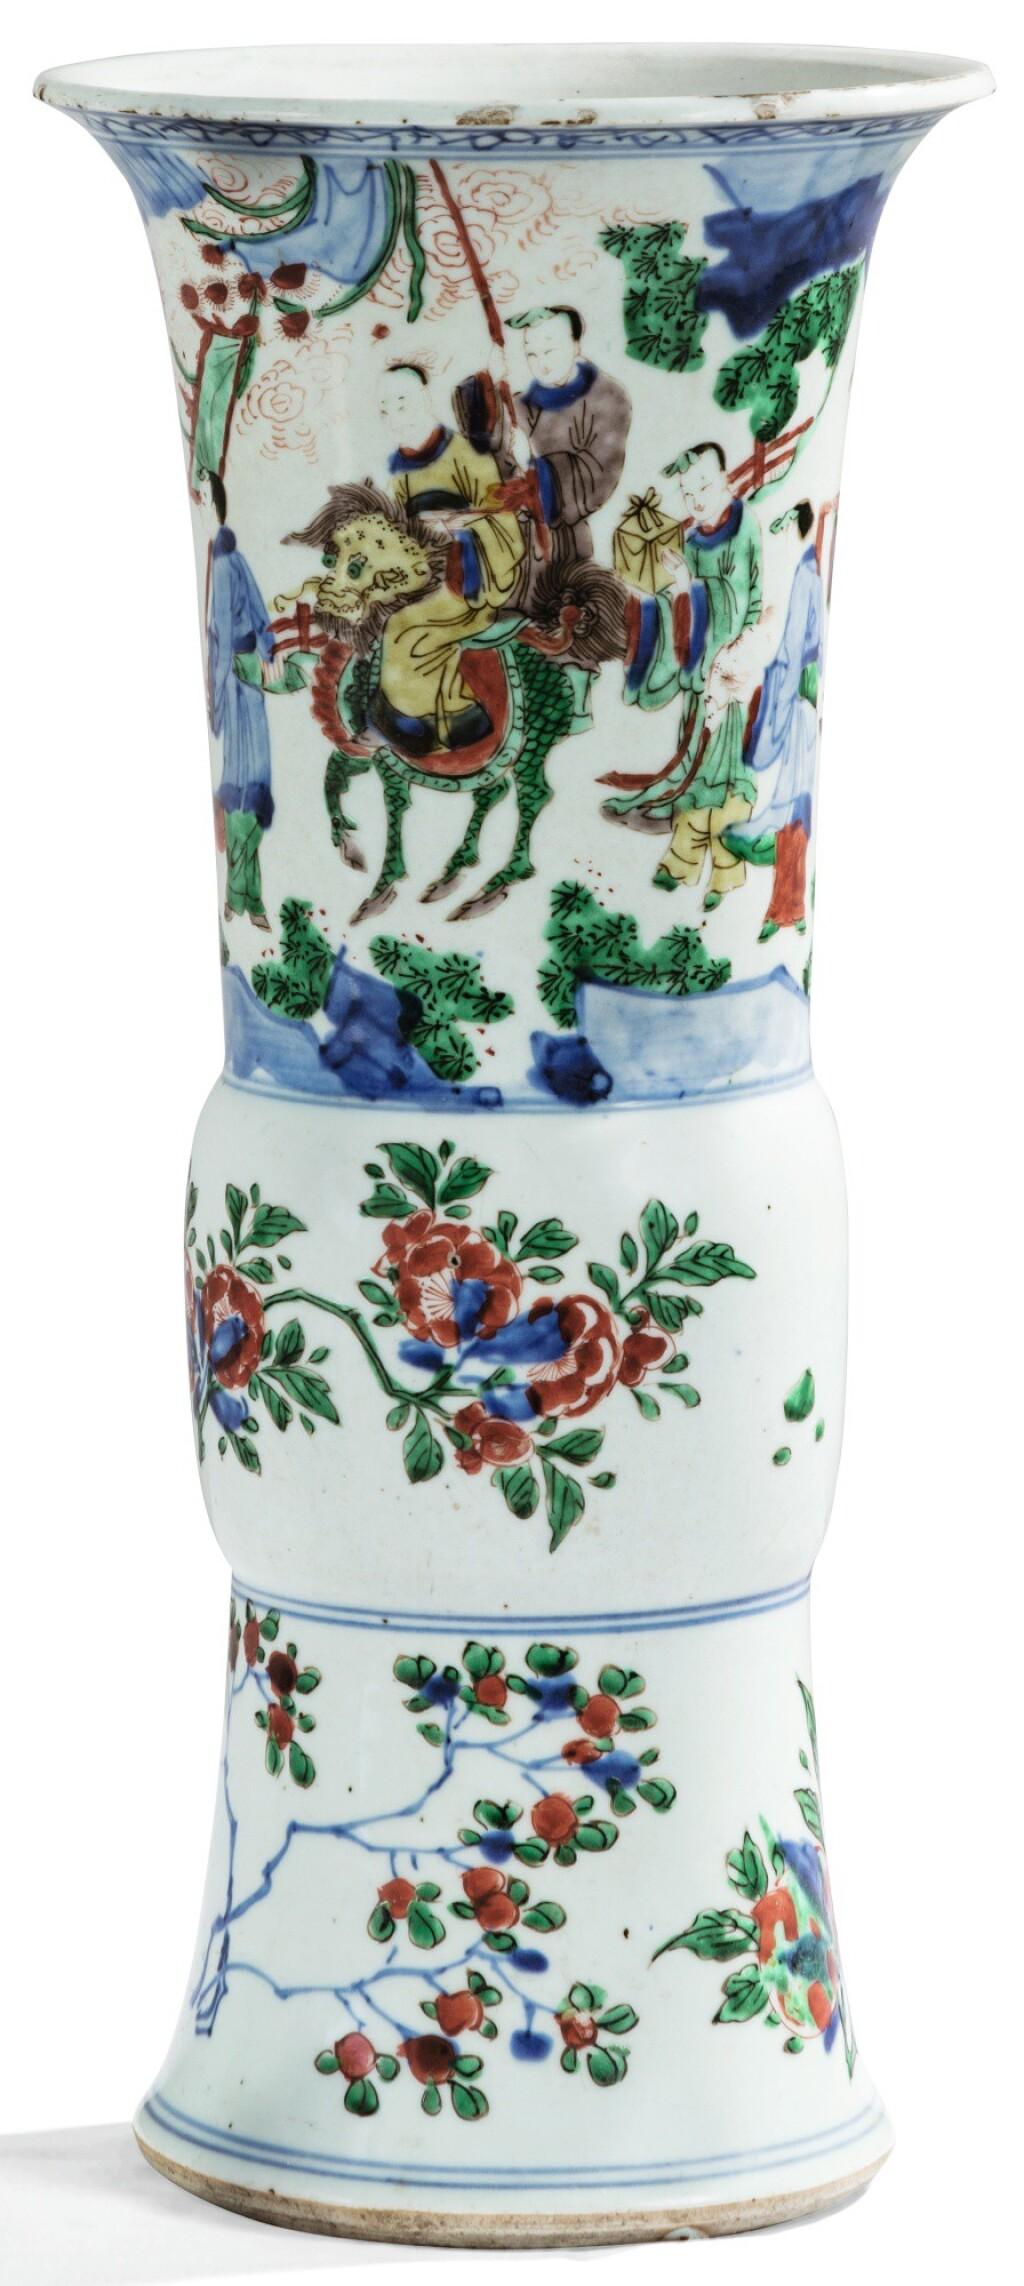 VASE EN PORCELAINE WUCAI, YEN YEN EPOQUE TRANSITION, XVIIE SIÈCLE | 清十七世紀 五彩人物故事花觚 | A wucai beaker vase, Transitional period, 17th century